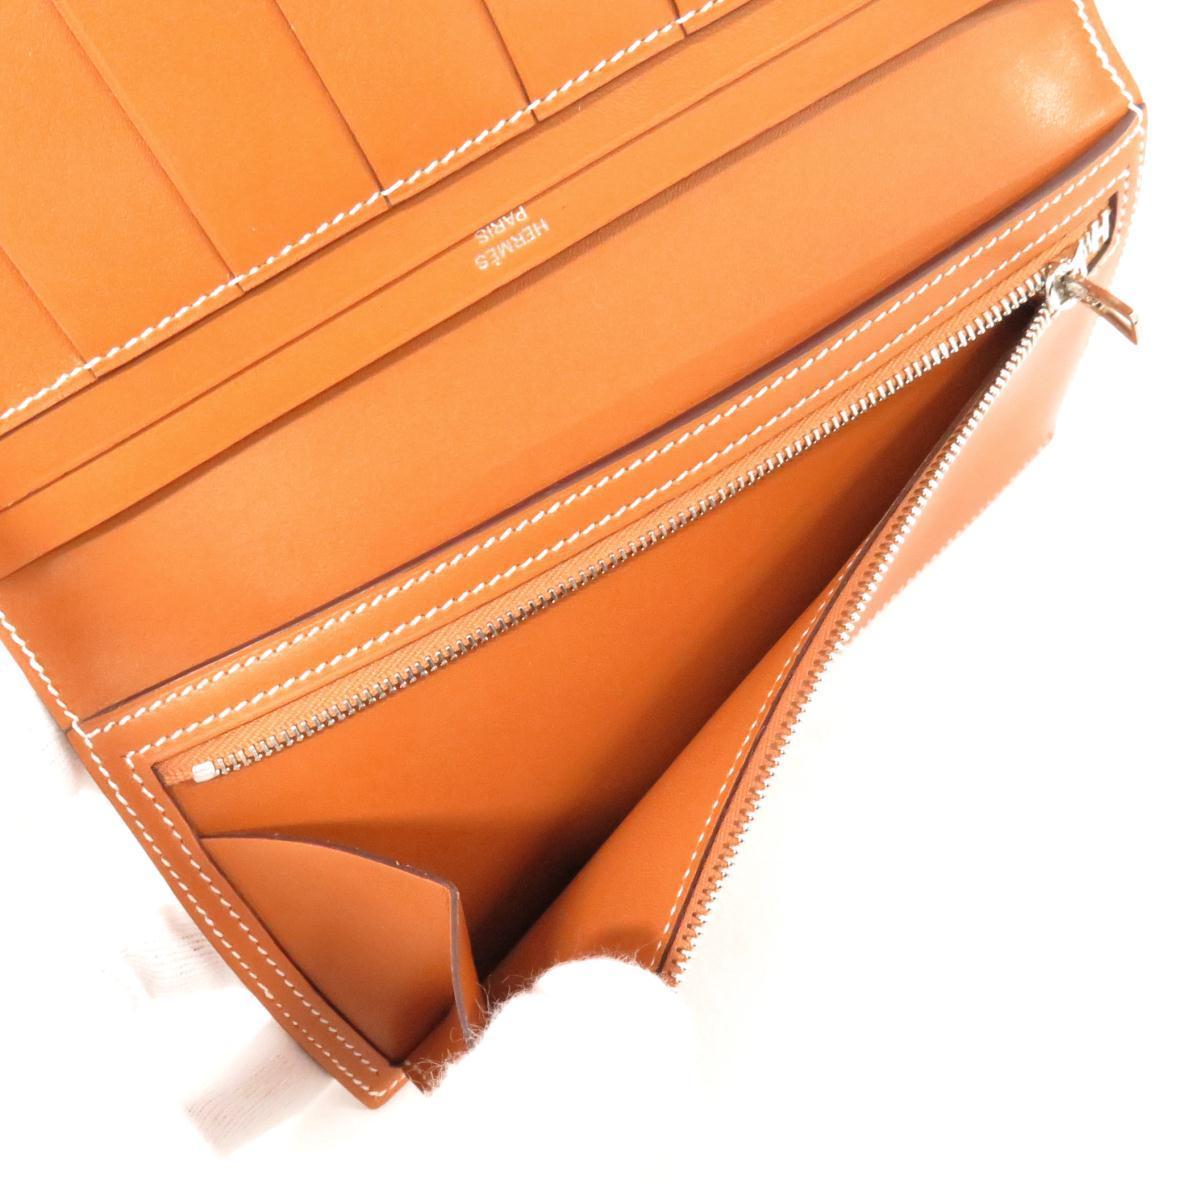 Ram Enamel Bag Charm Keyring Re Zero Starting Life in Another World Gift # 339